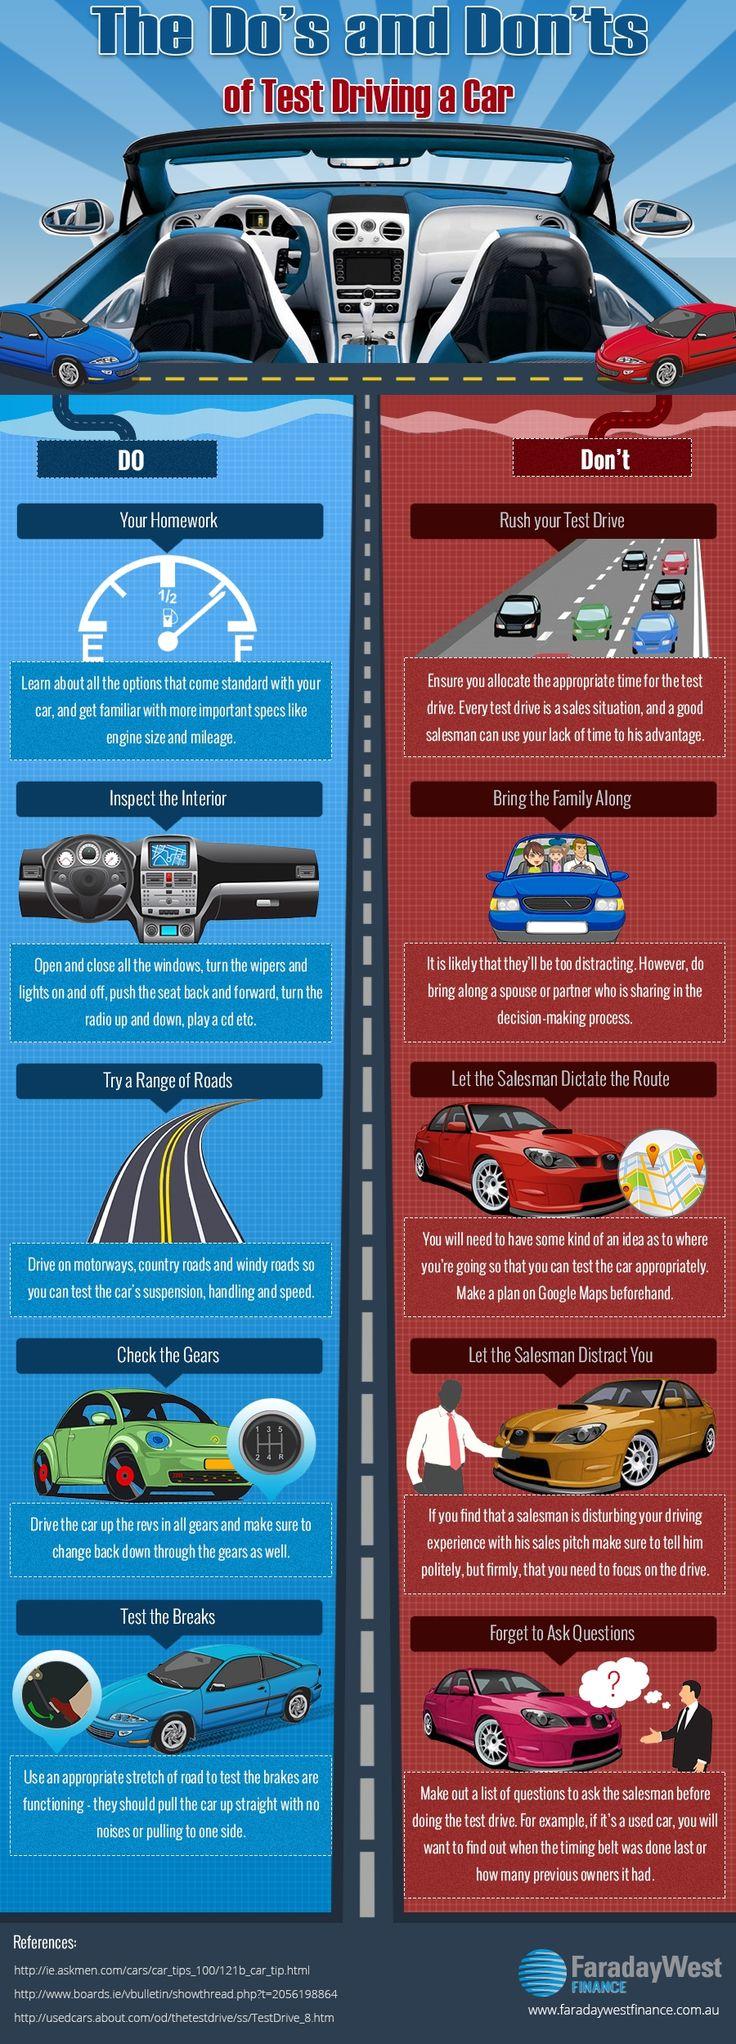 Wjl Samples European Vehicle Timing Belt Diagram